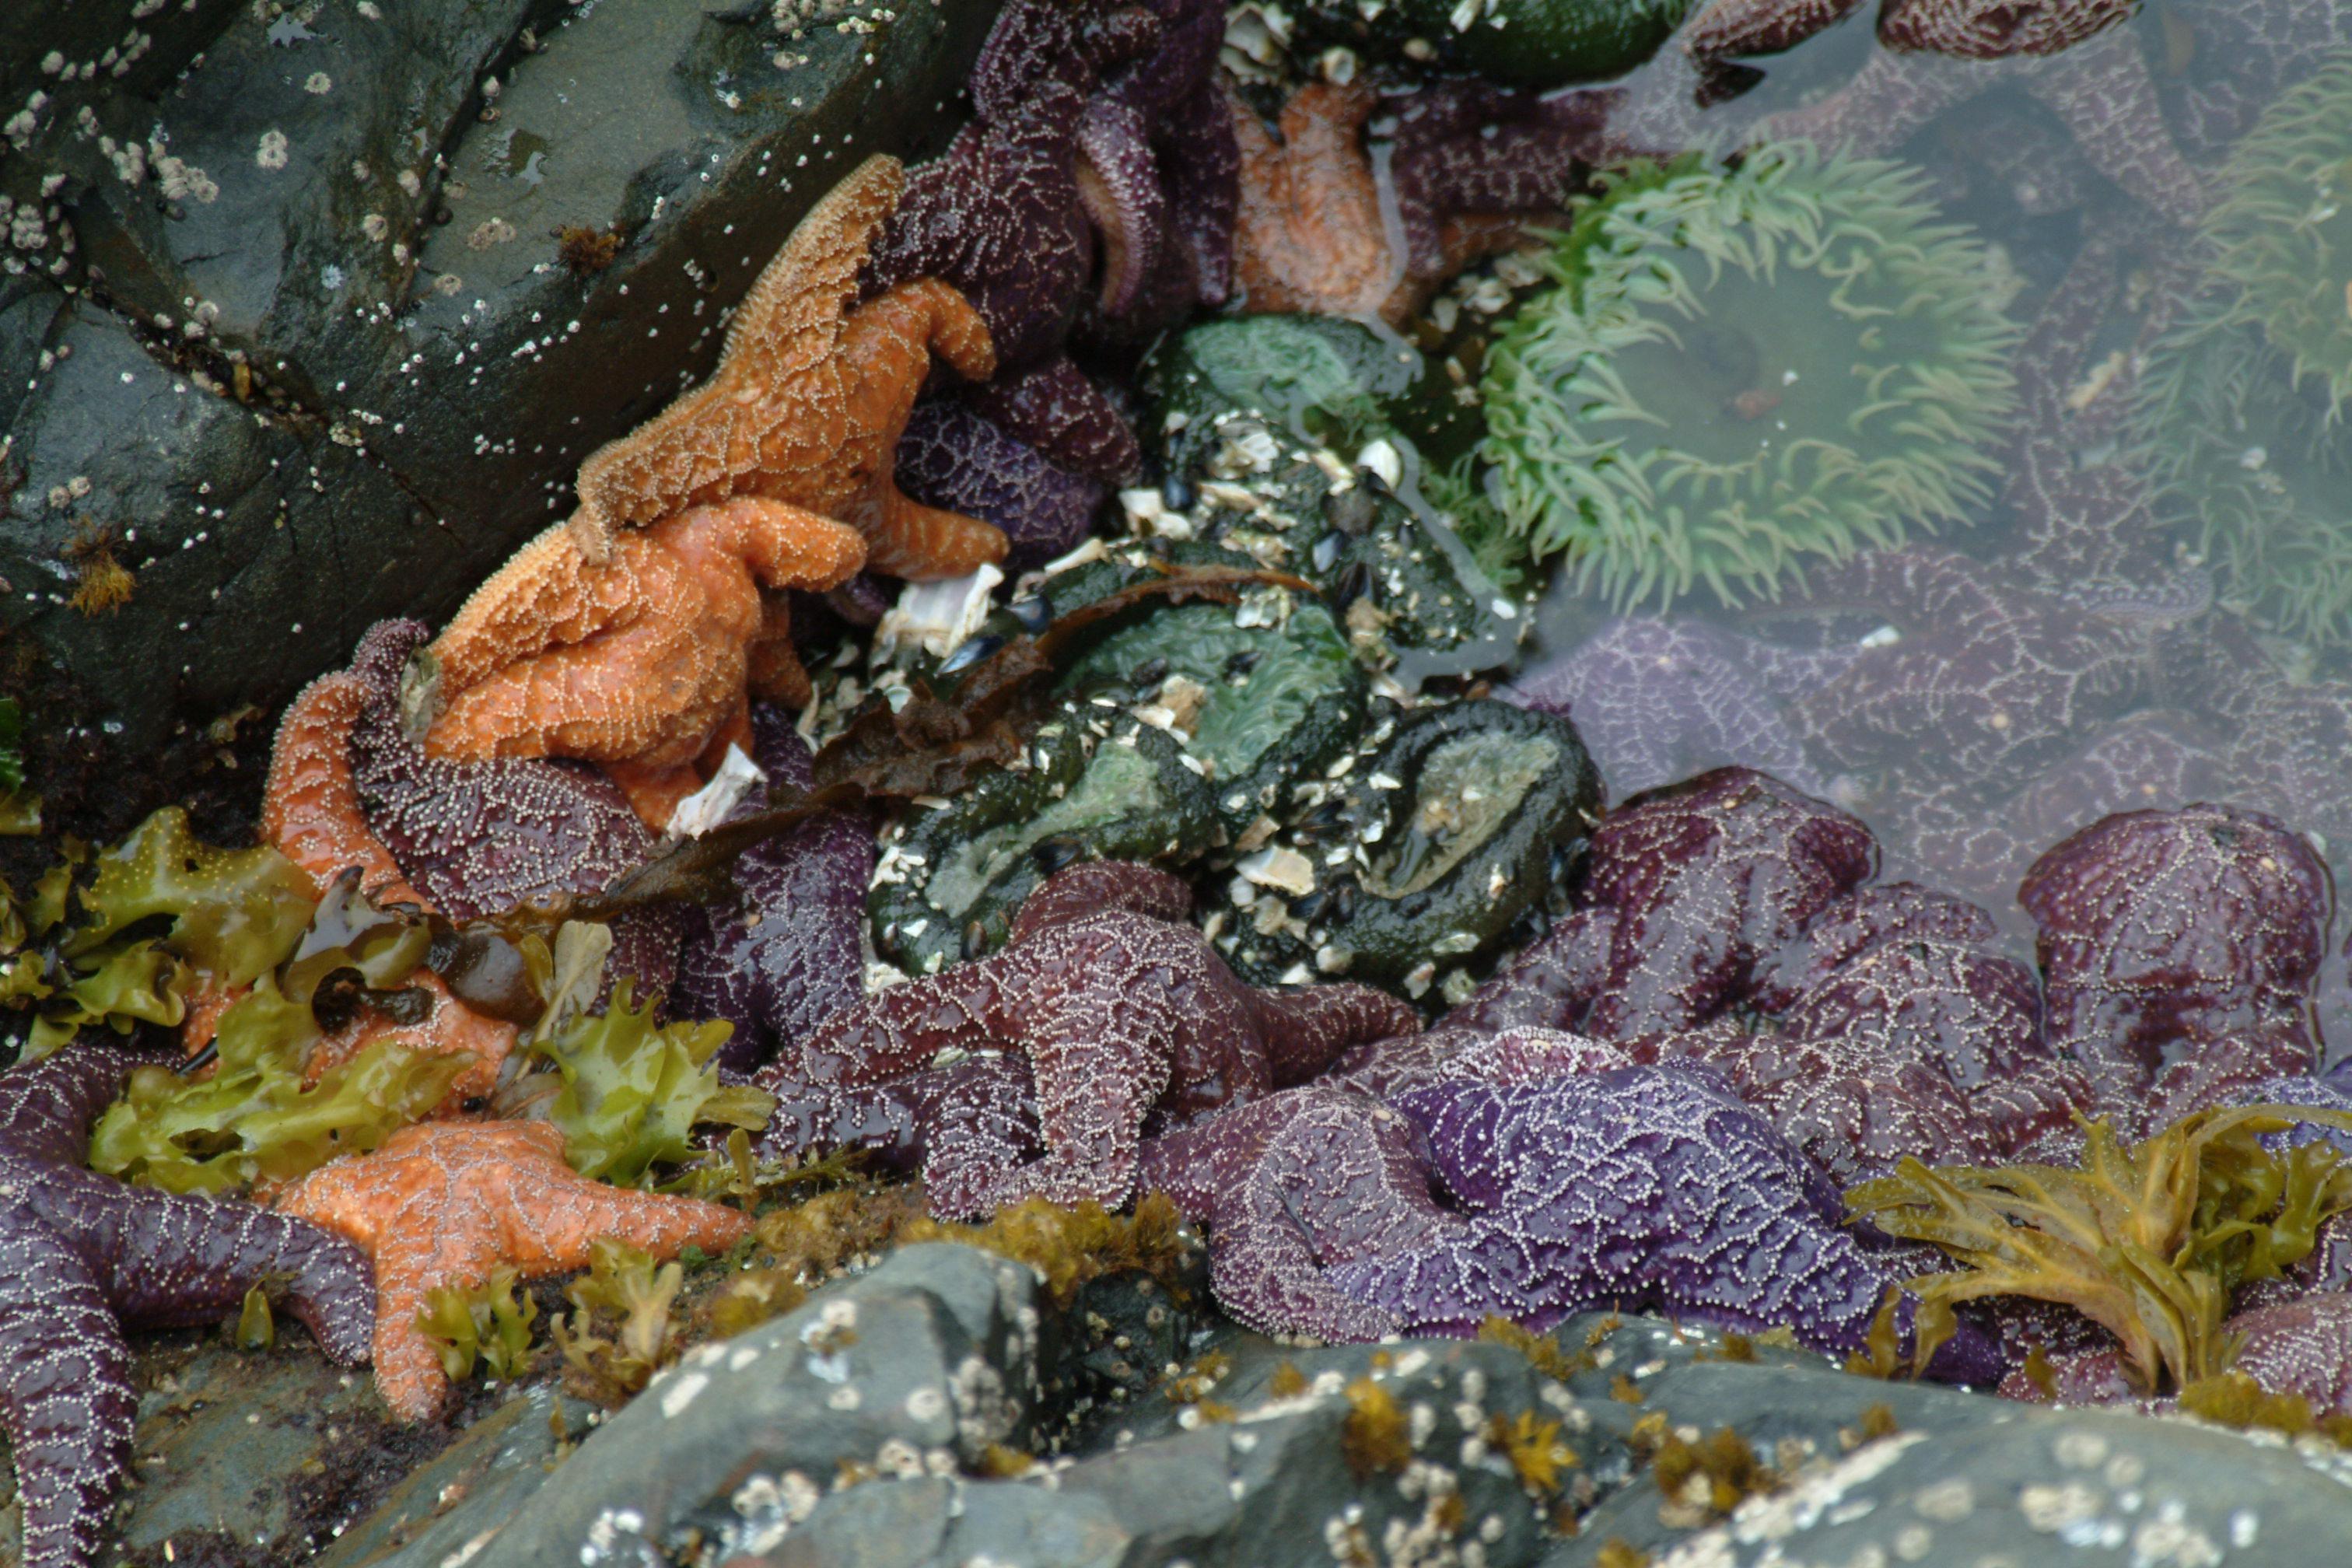 #starafish, #alaska, #nature, #wildlife